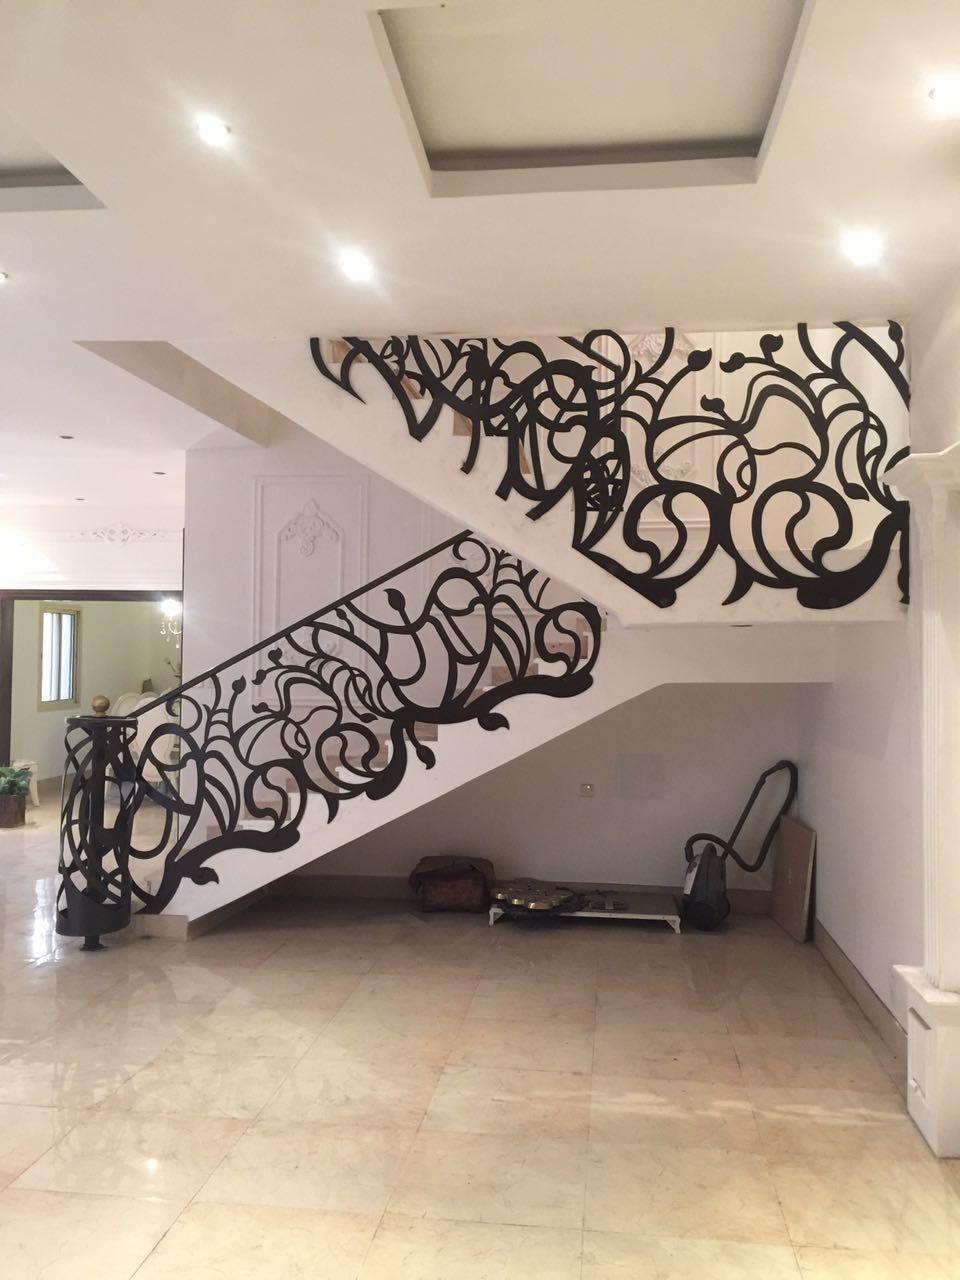 Door Metaldoor Creativemetals Saudiarabia Riyadh Laser Cnc Outdoor Stairs Staircase Design Stairs Design Modern Stair Railing Design